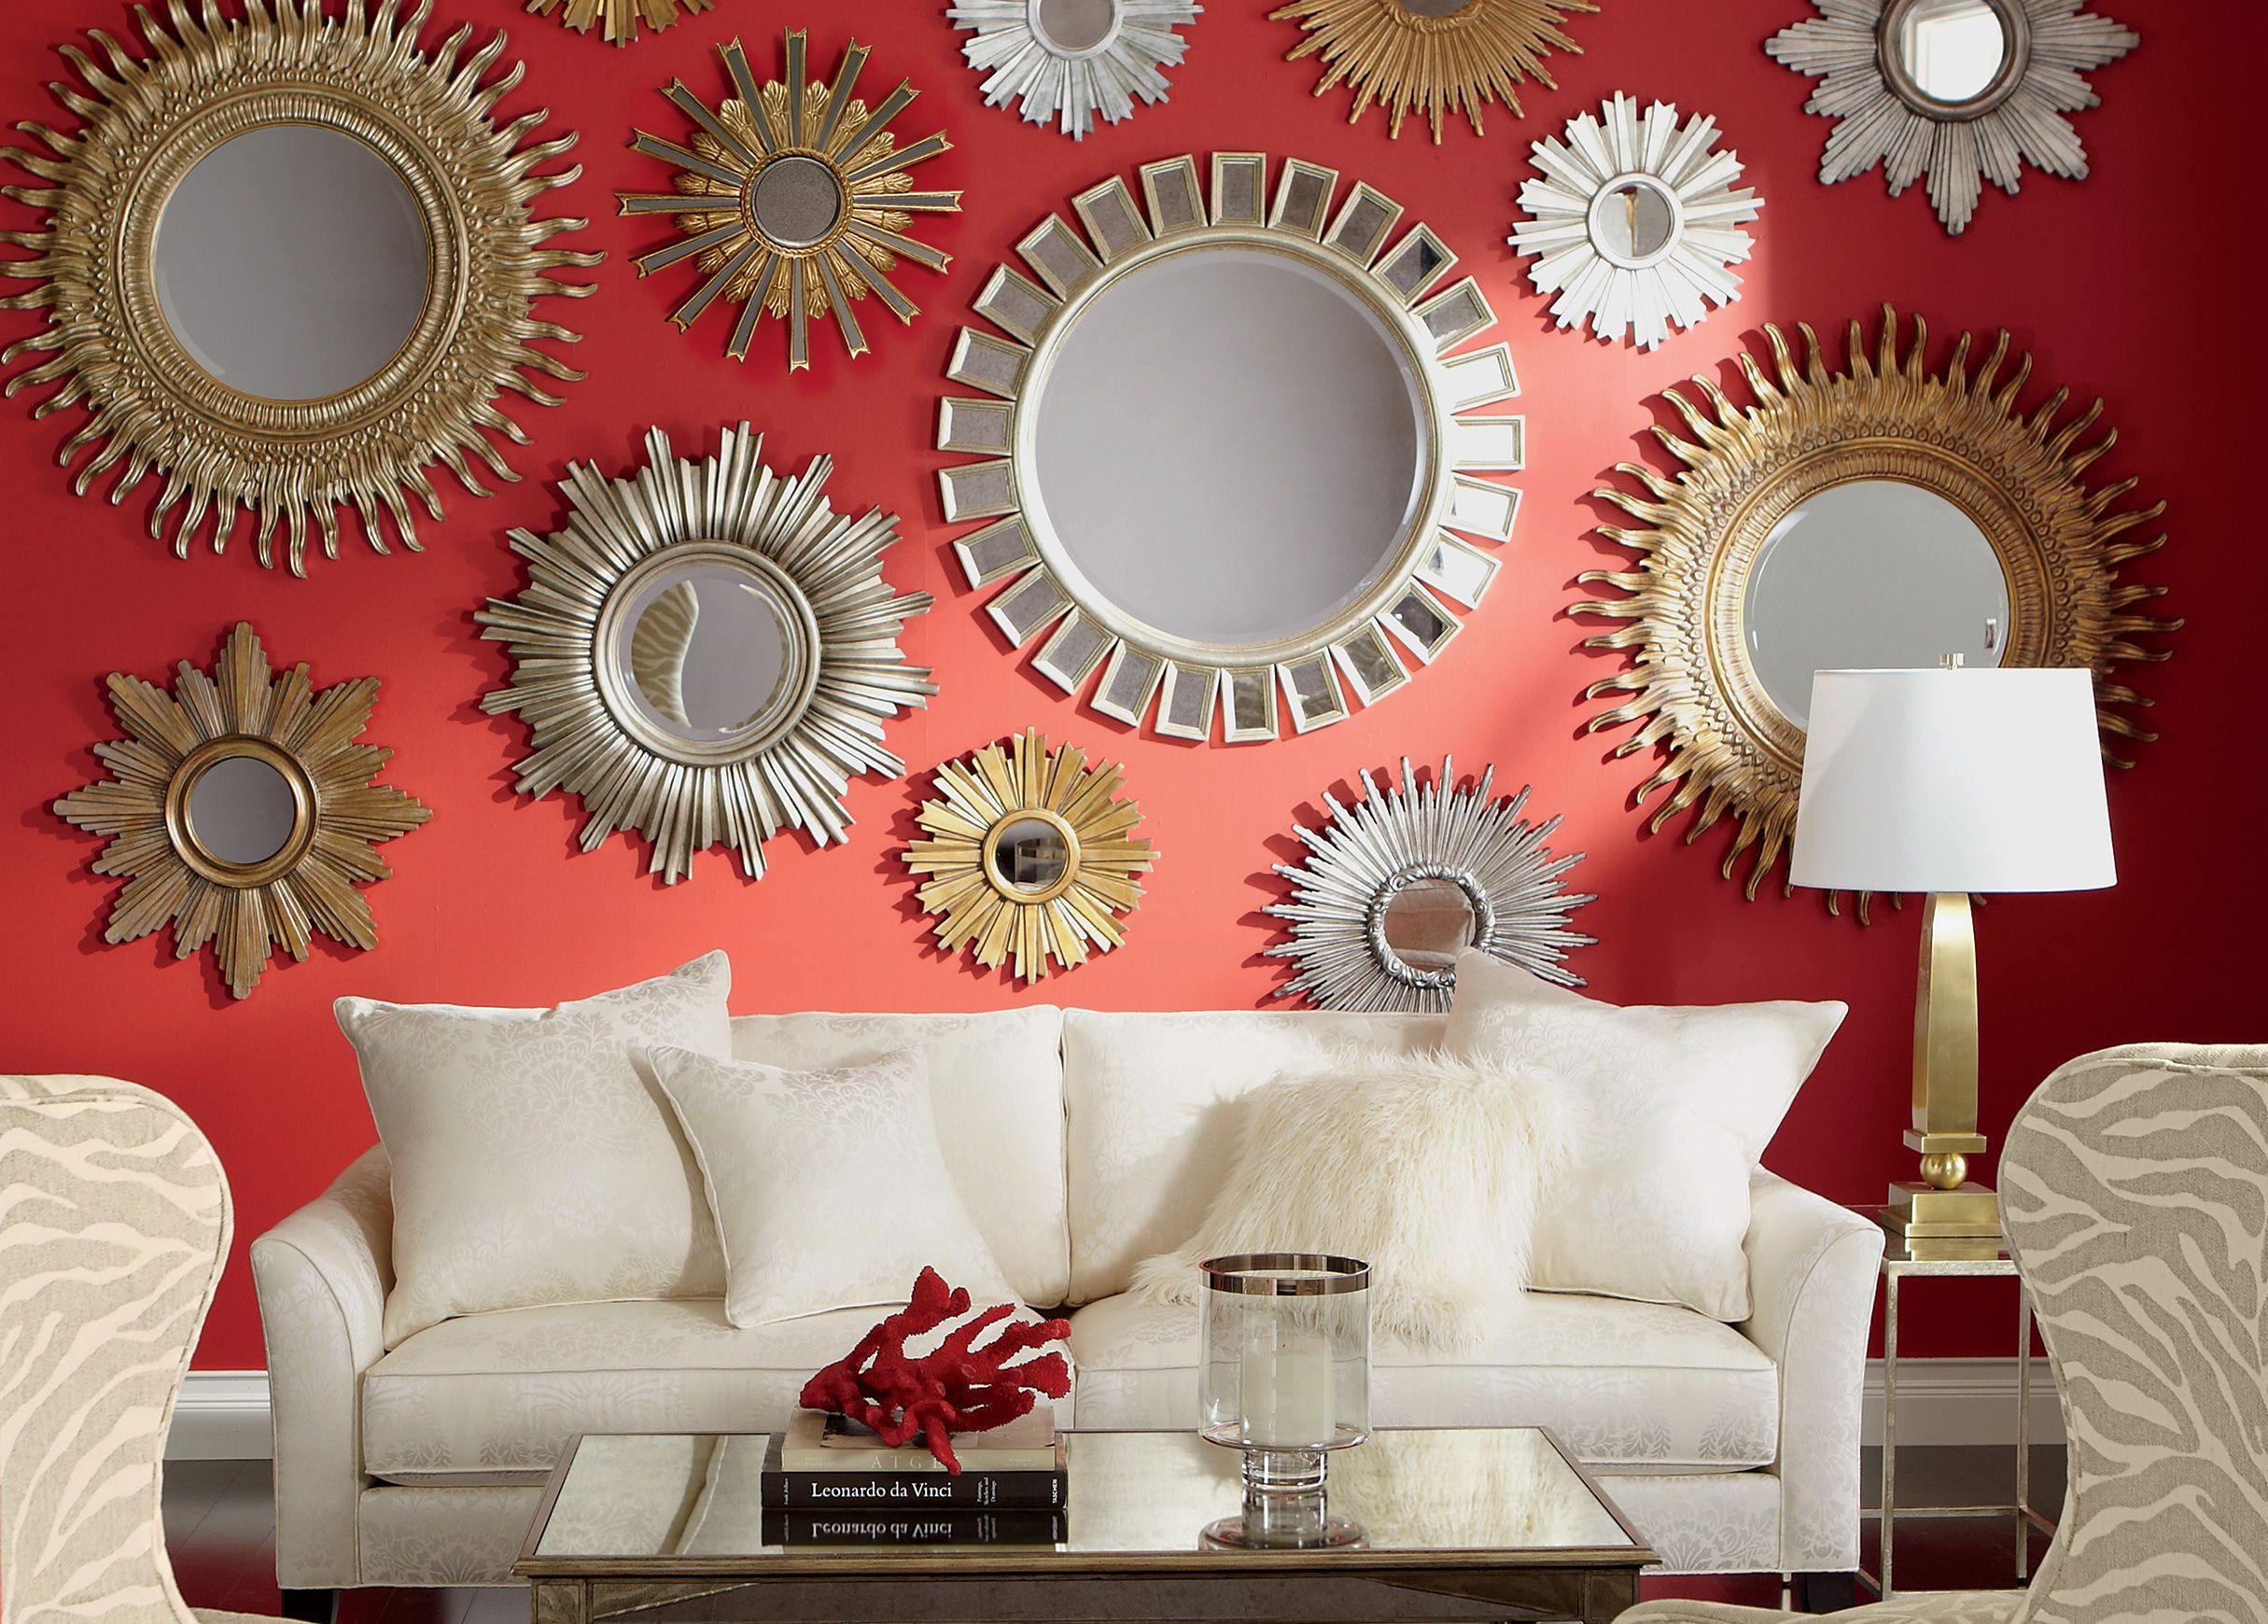 Mini Silver Starburst Mirror Mirror Decor Mirror Wall Living Room Mirror Design Wall #silver #mirrors #for #living #room